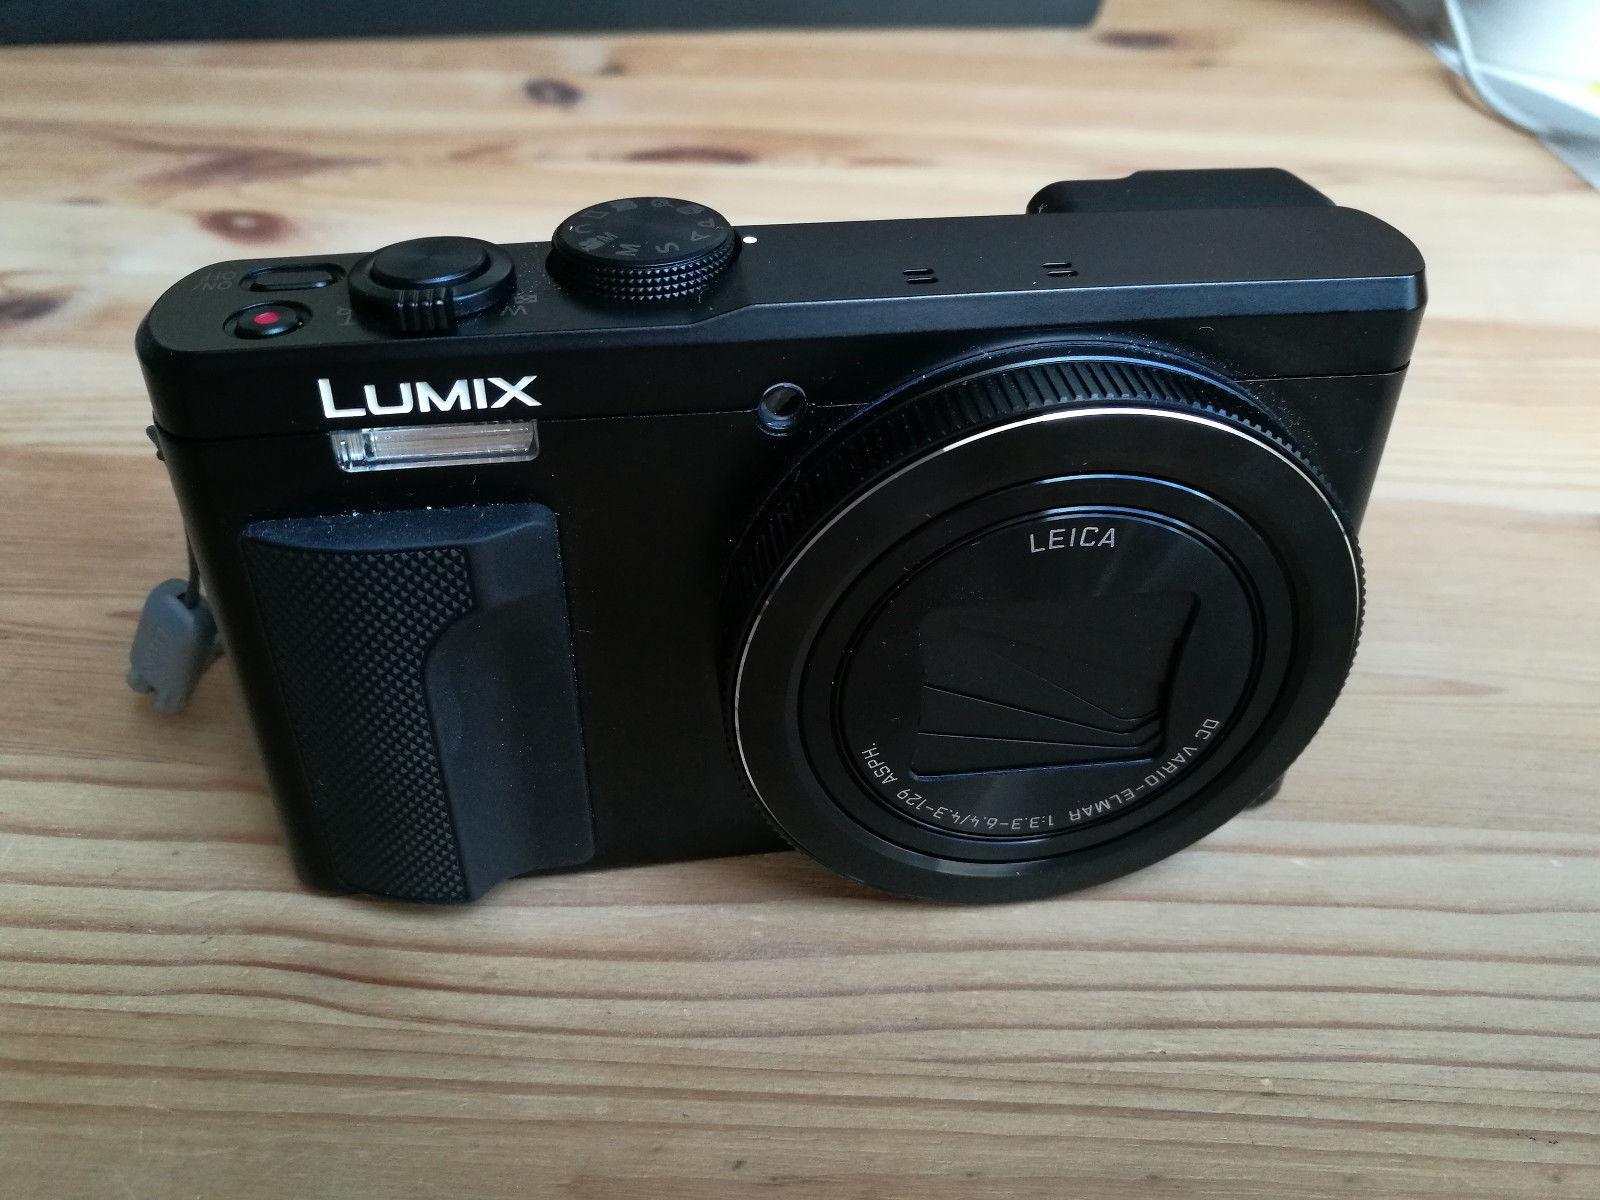 Panasonic Lumix (Dmc-tz81) Digitalkamera Tz81 - Schwarz